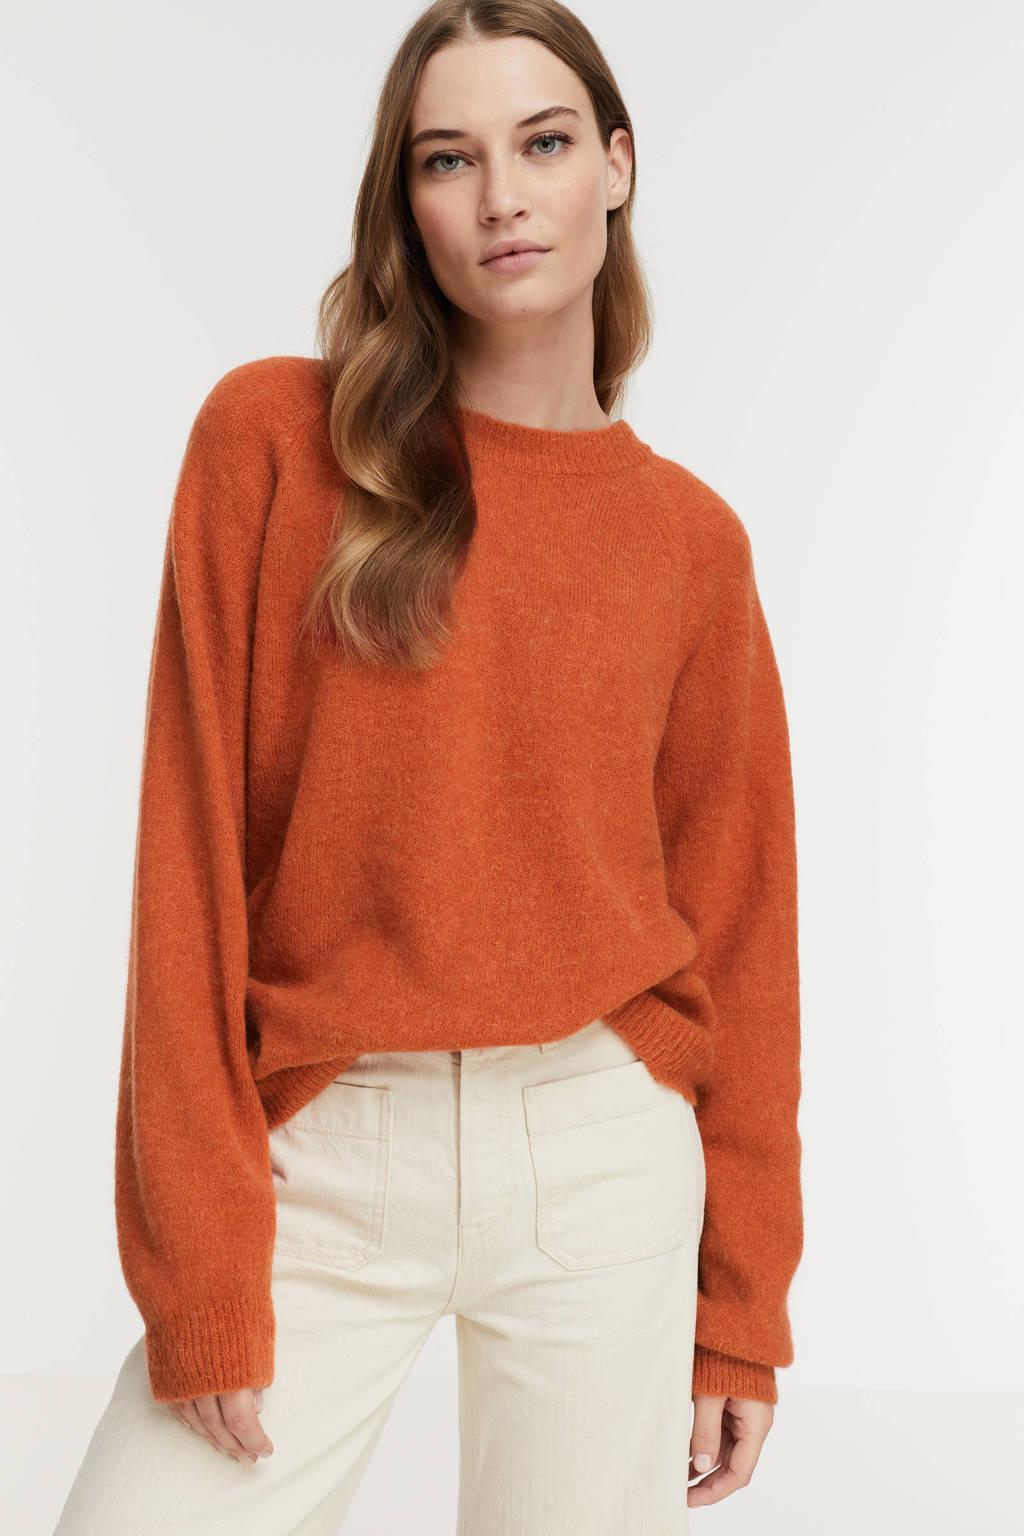 Geisha gebreide trui met wol oranje, Oranje